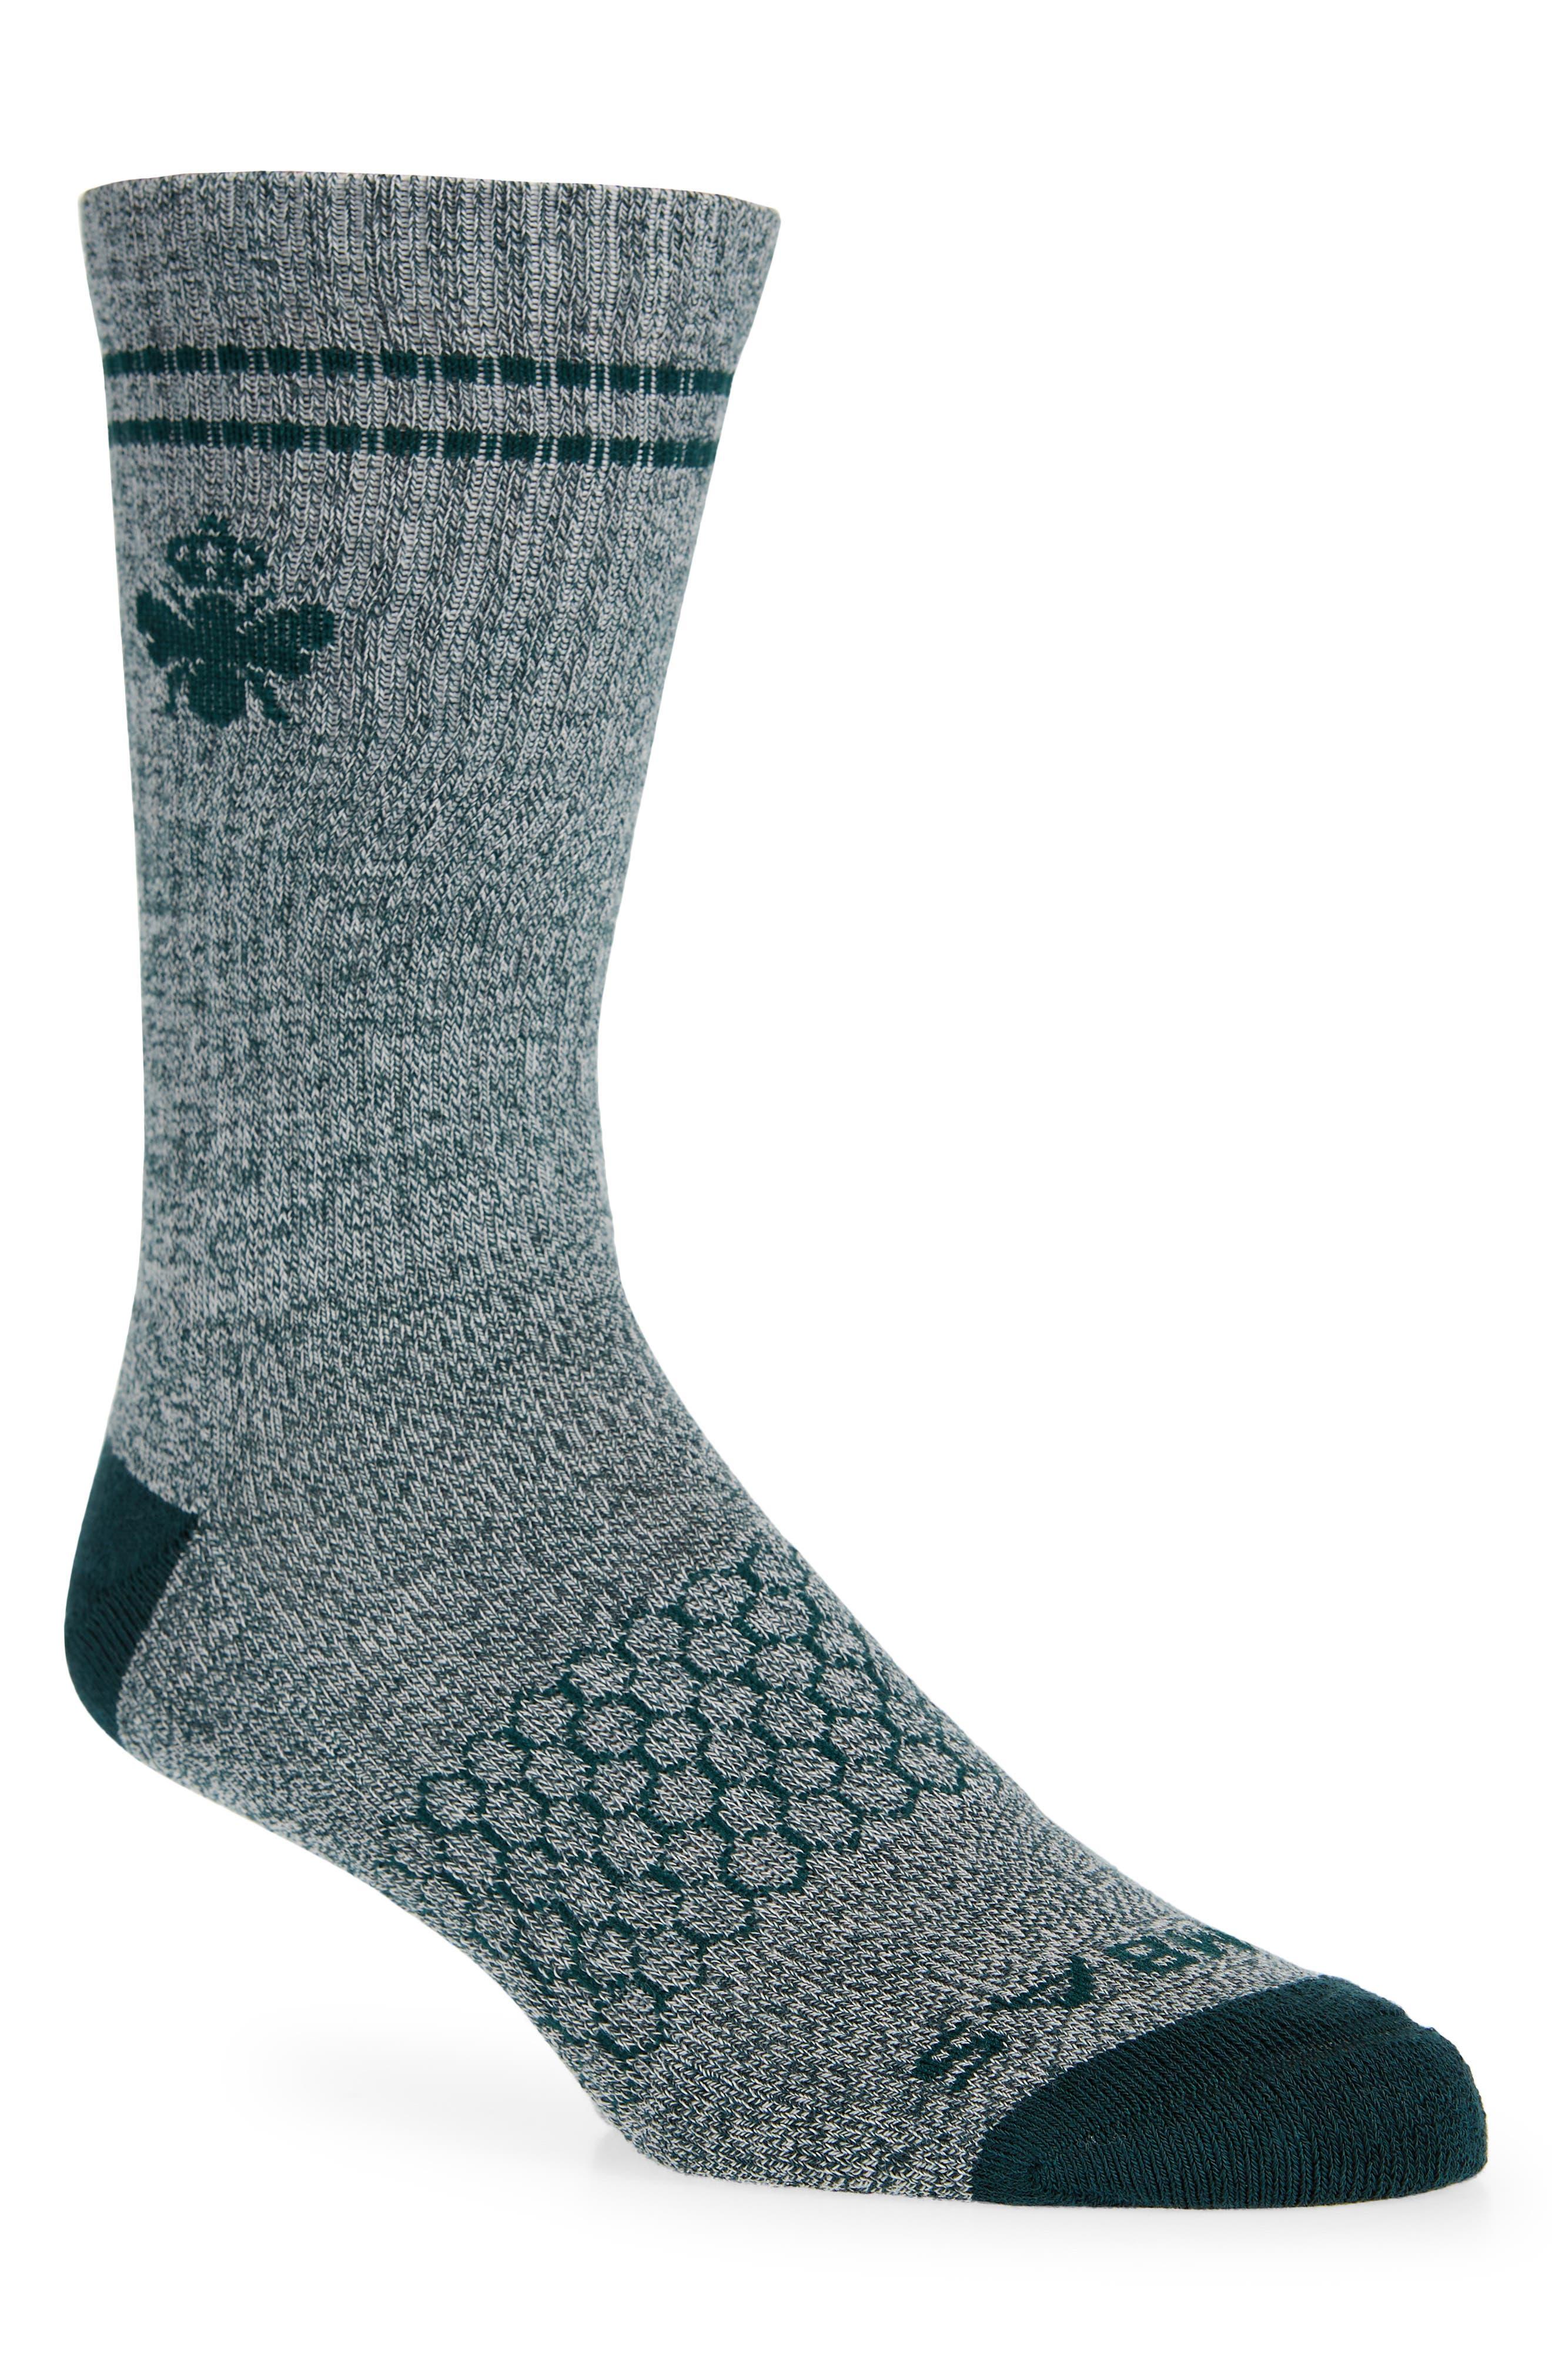 Originals Crew Socks